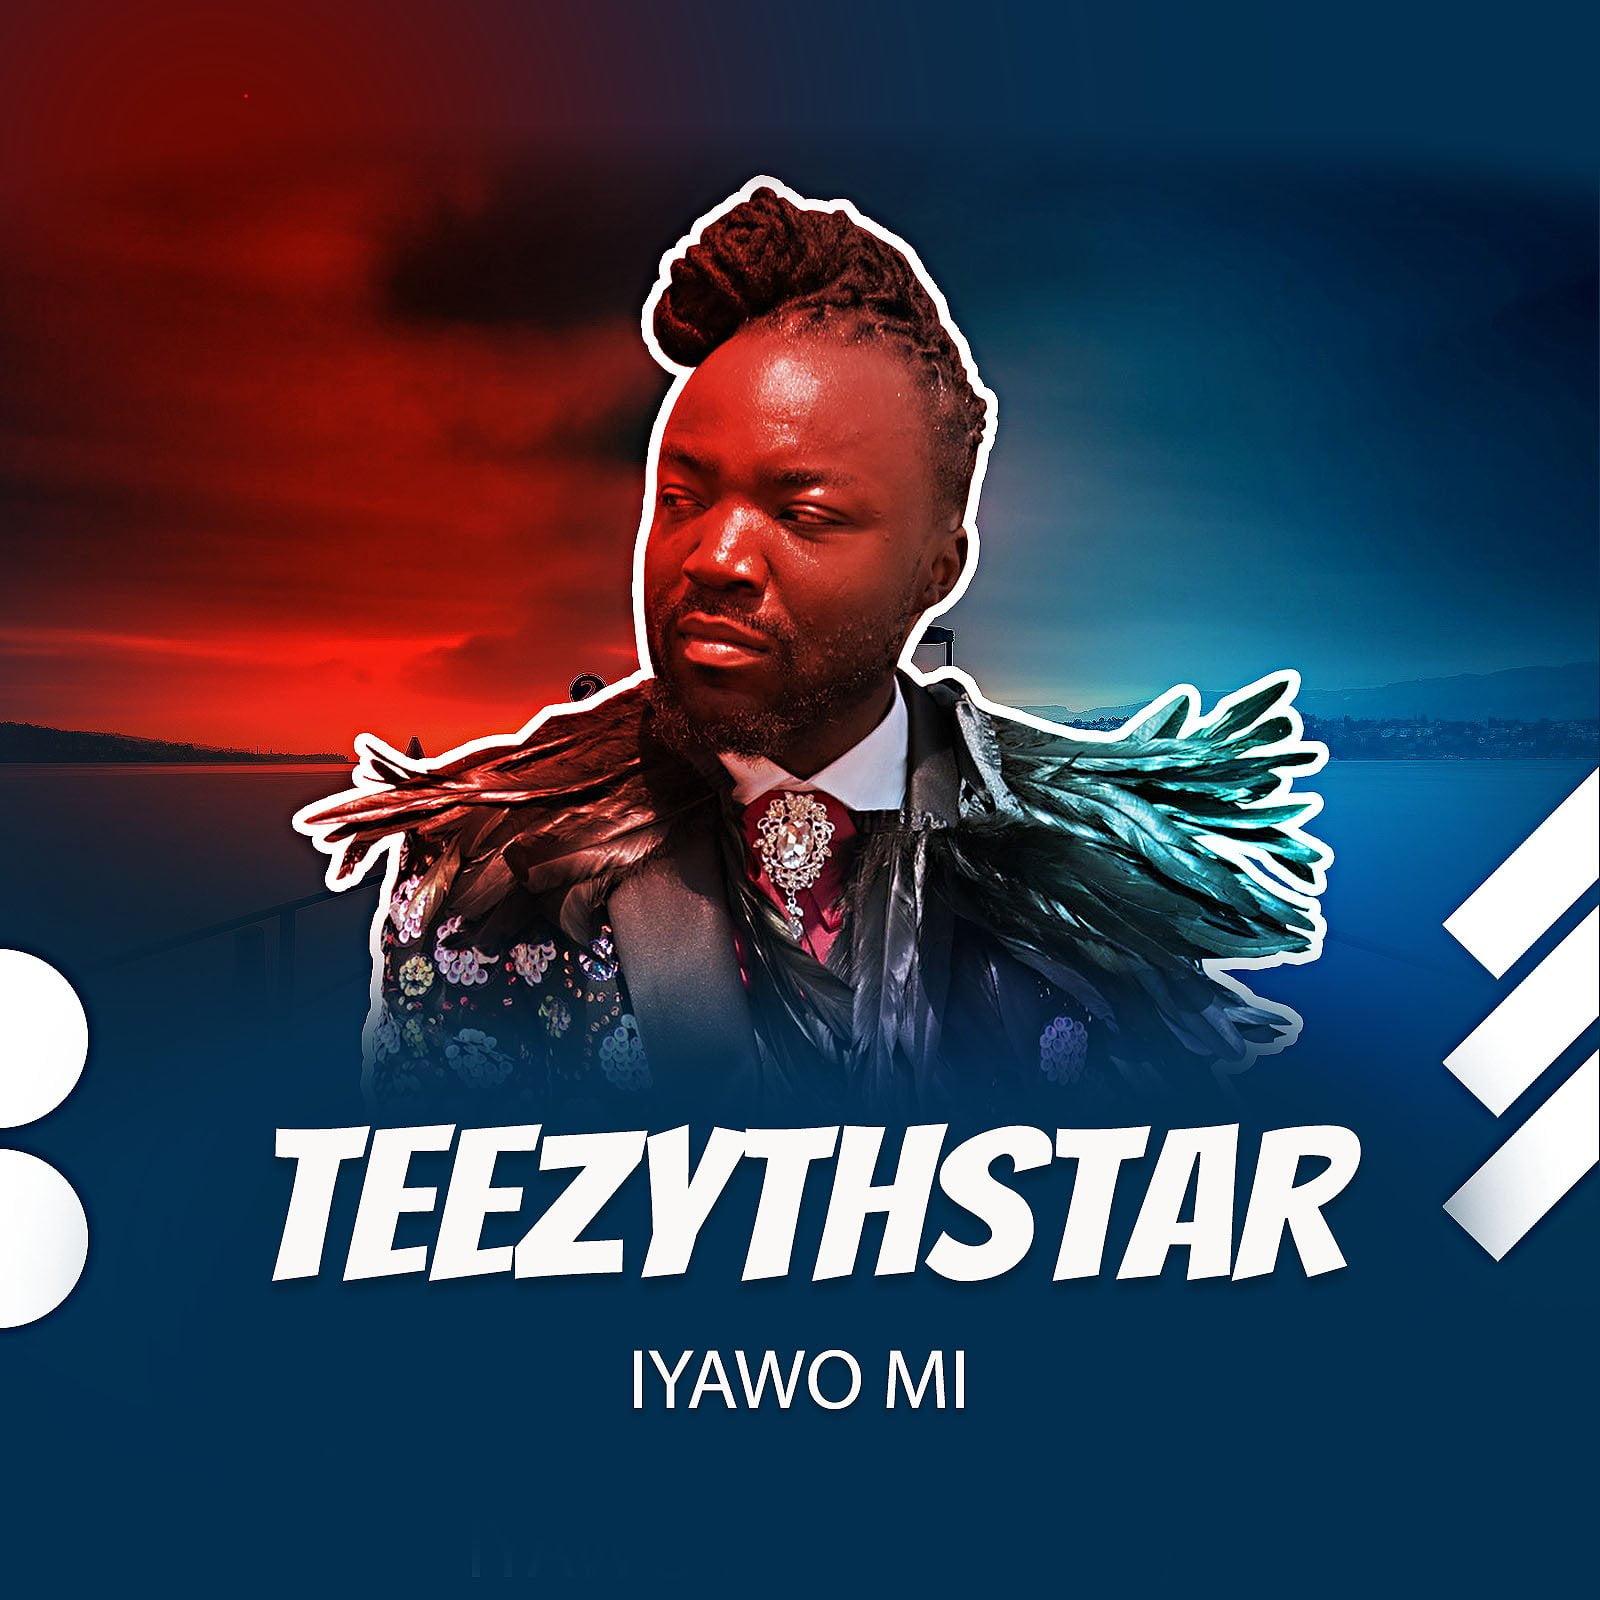 Iyawo - #Nigeria: Music: Teezythstar - Iyawo mi